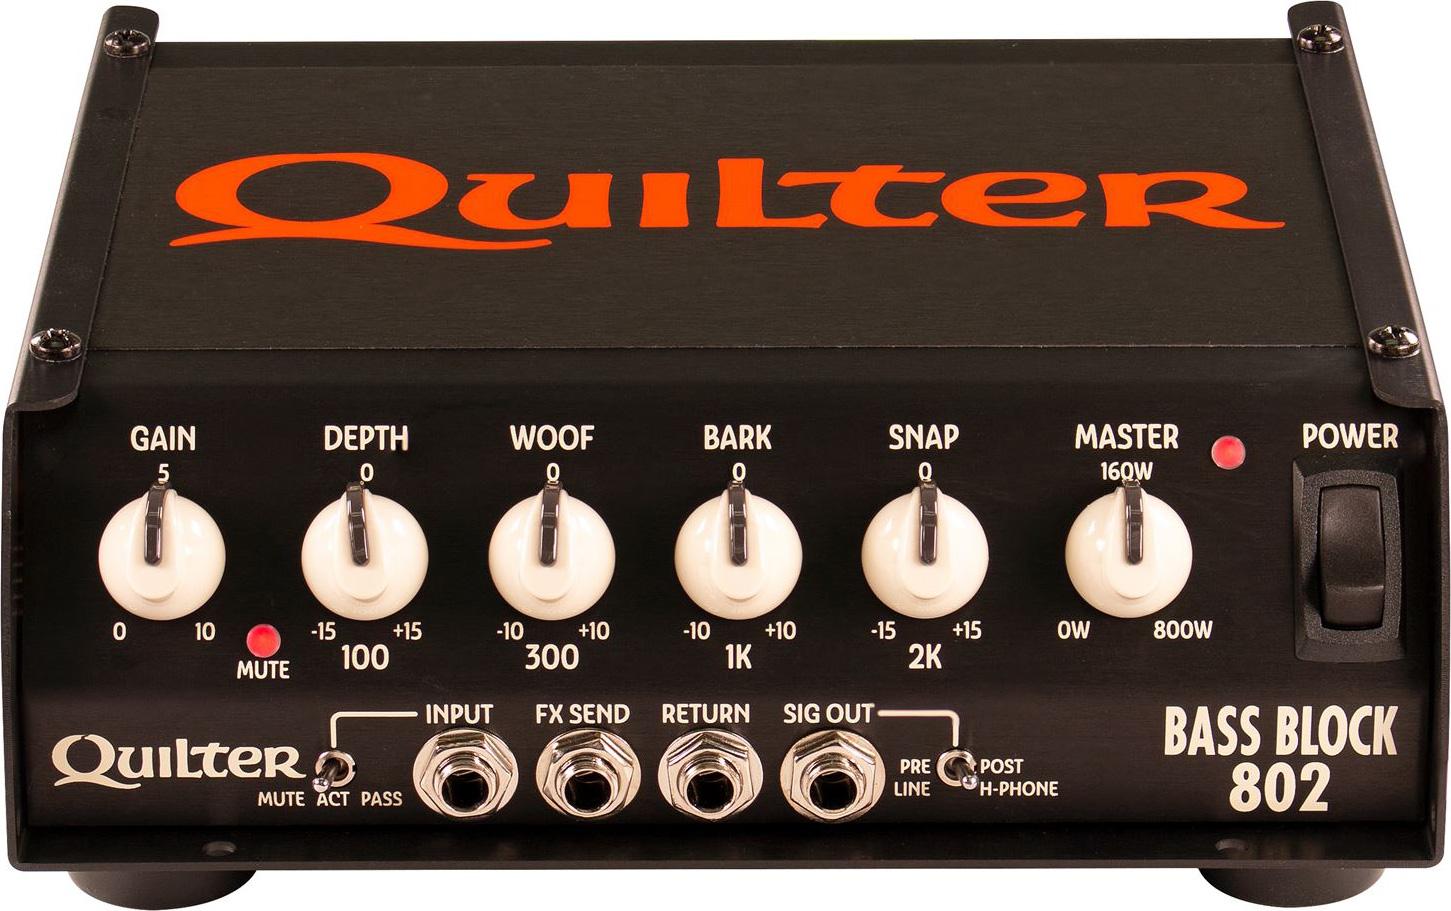 Quilter Bass Block 802 Amp